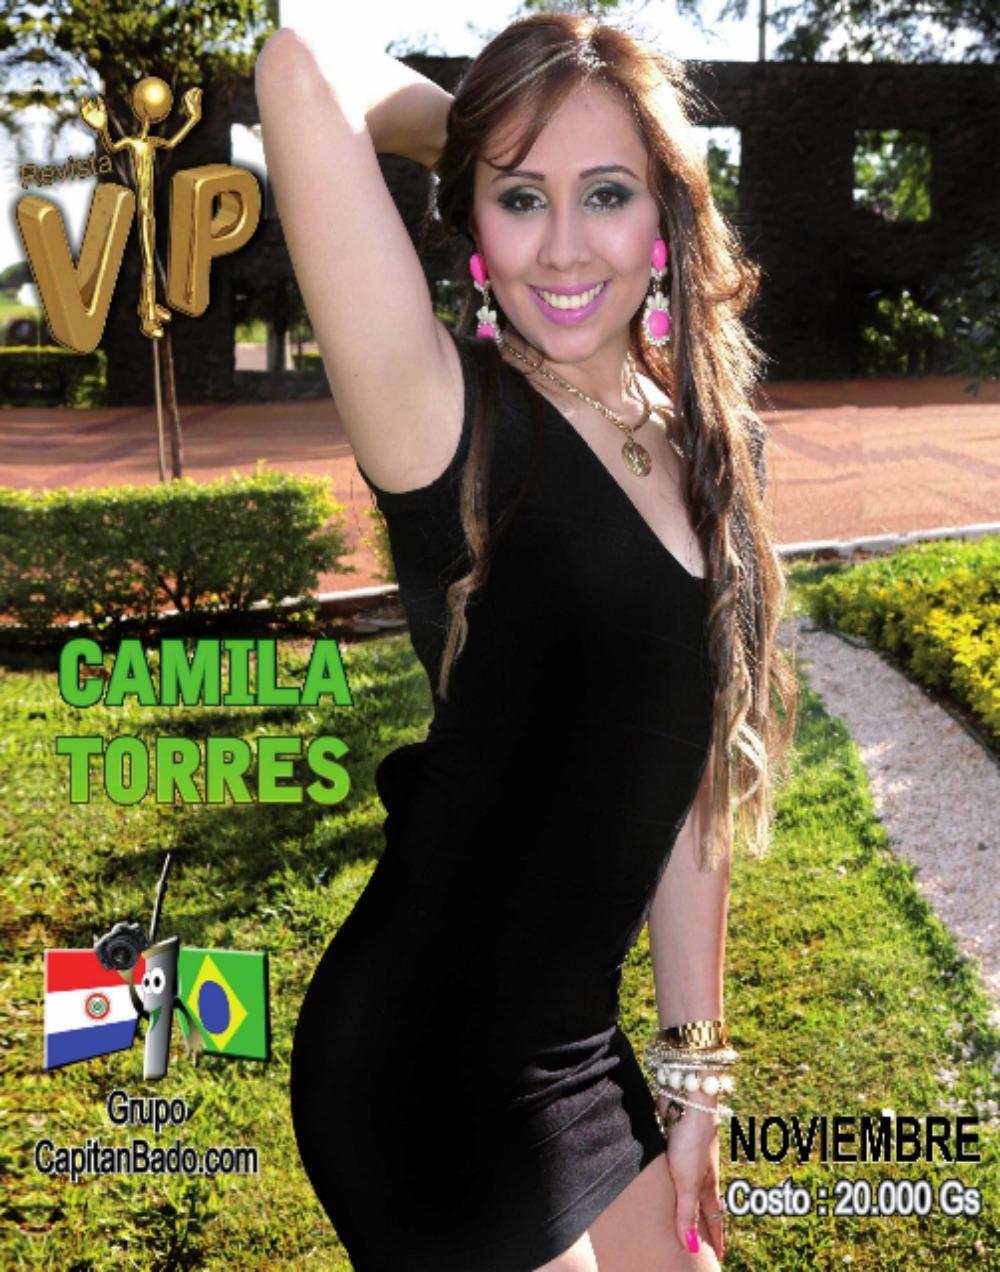 Vip 8 Paraguay